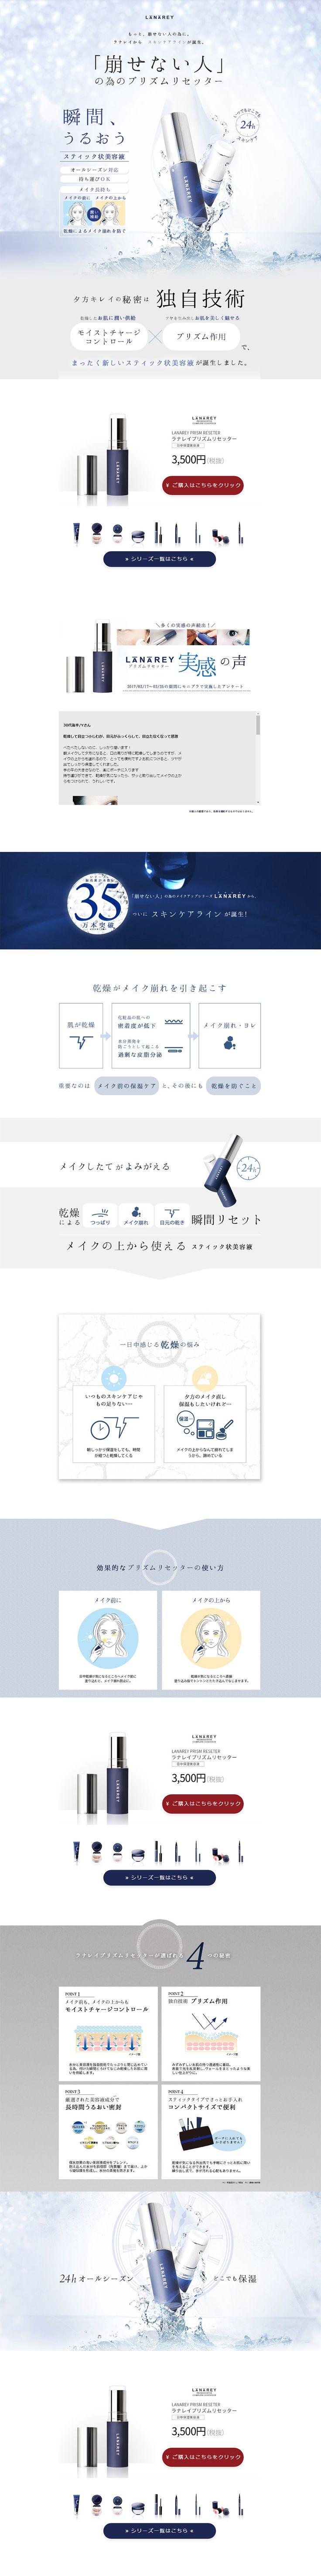 LANAREY PRISM RESETER【スキンケア・美容商品関連】のLPデザイン。WEBデザイナーさん必見!ランディングページのデザイン参考に(キレイ系)